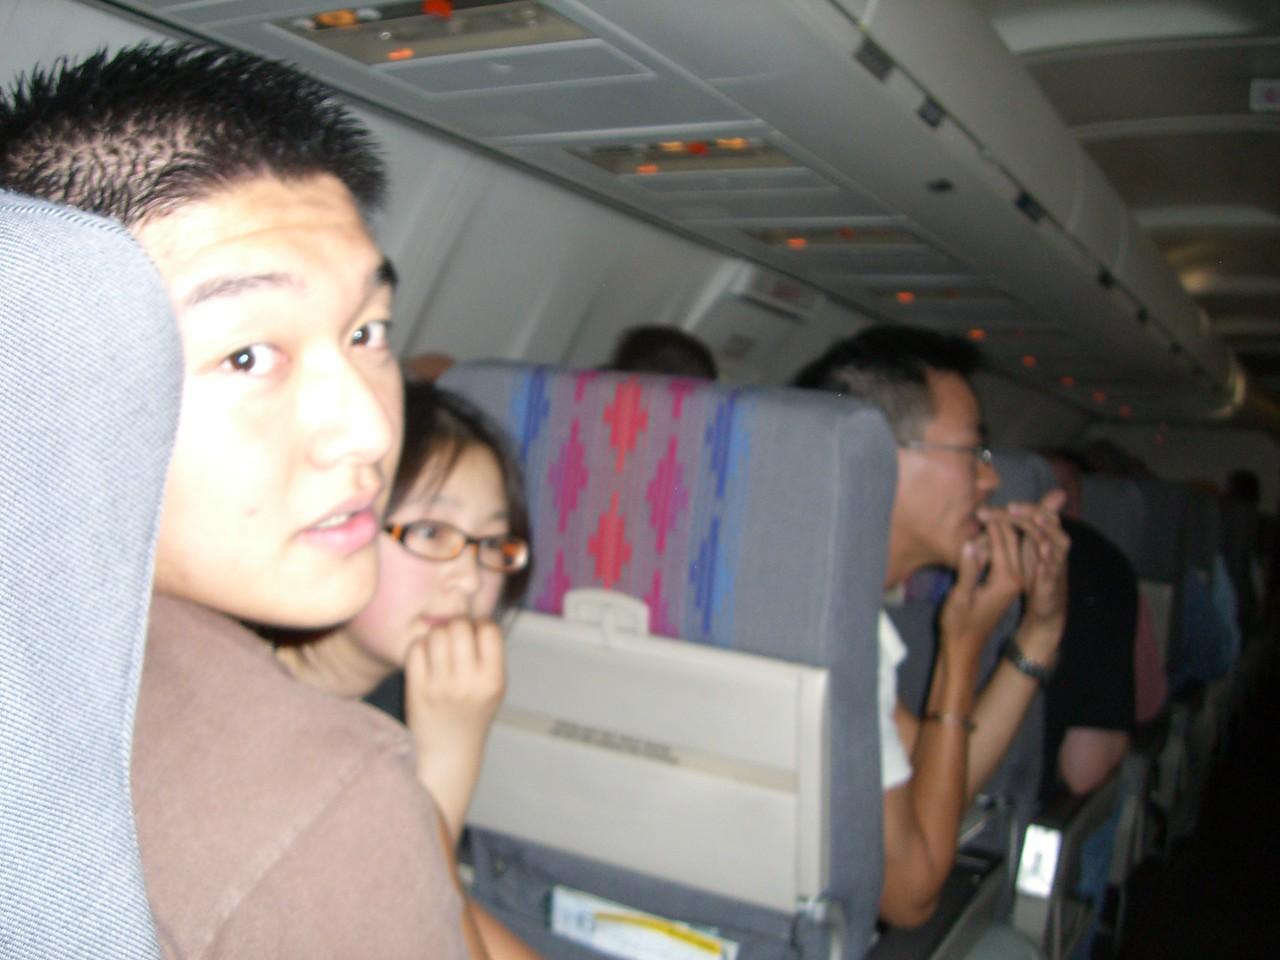 2006 07 12 Wed - Dan Tung, Angela Hsu, & Ben Yu on the plane